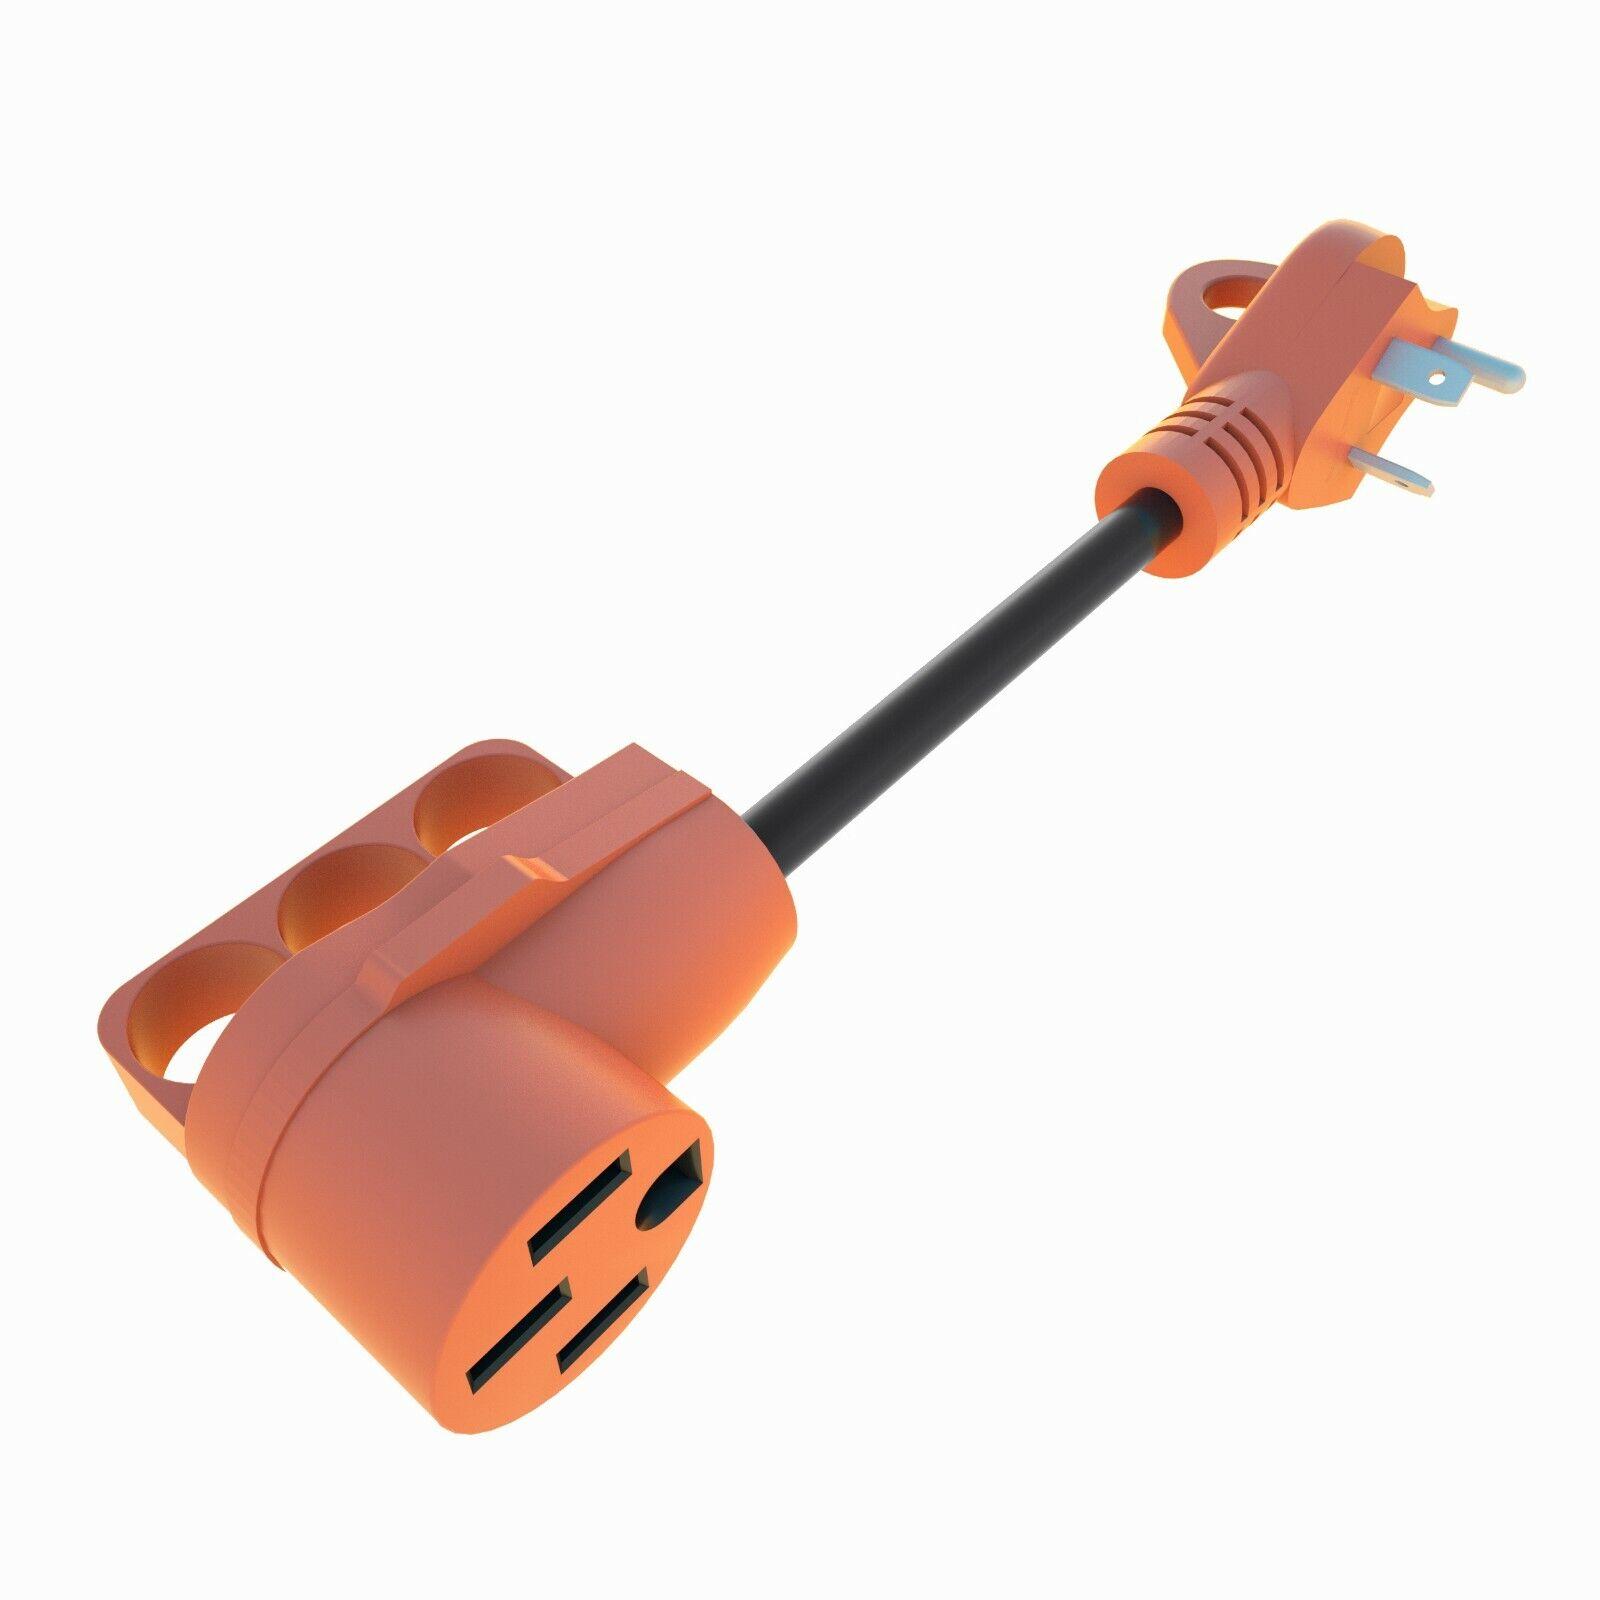 30 Amp Male to 50 Amp Female Dogbone Adapter RV Camper Electrical Converter Cord eBay Motors